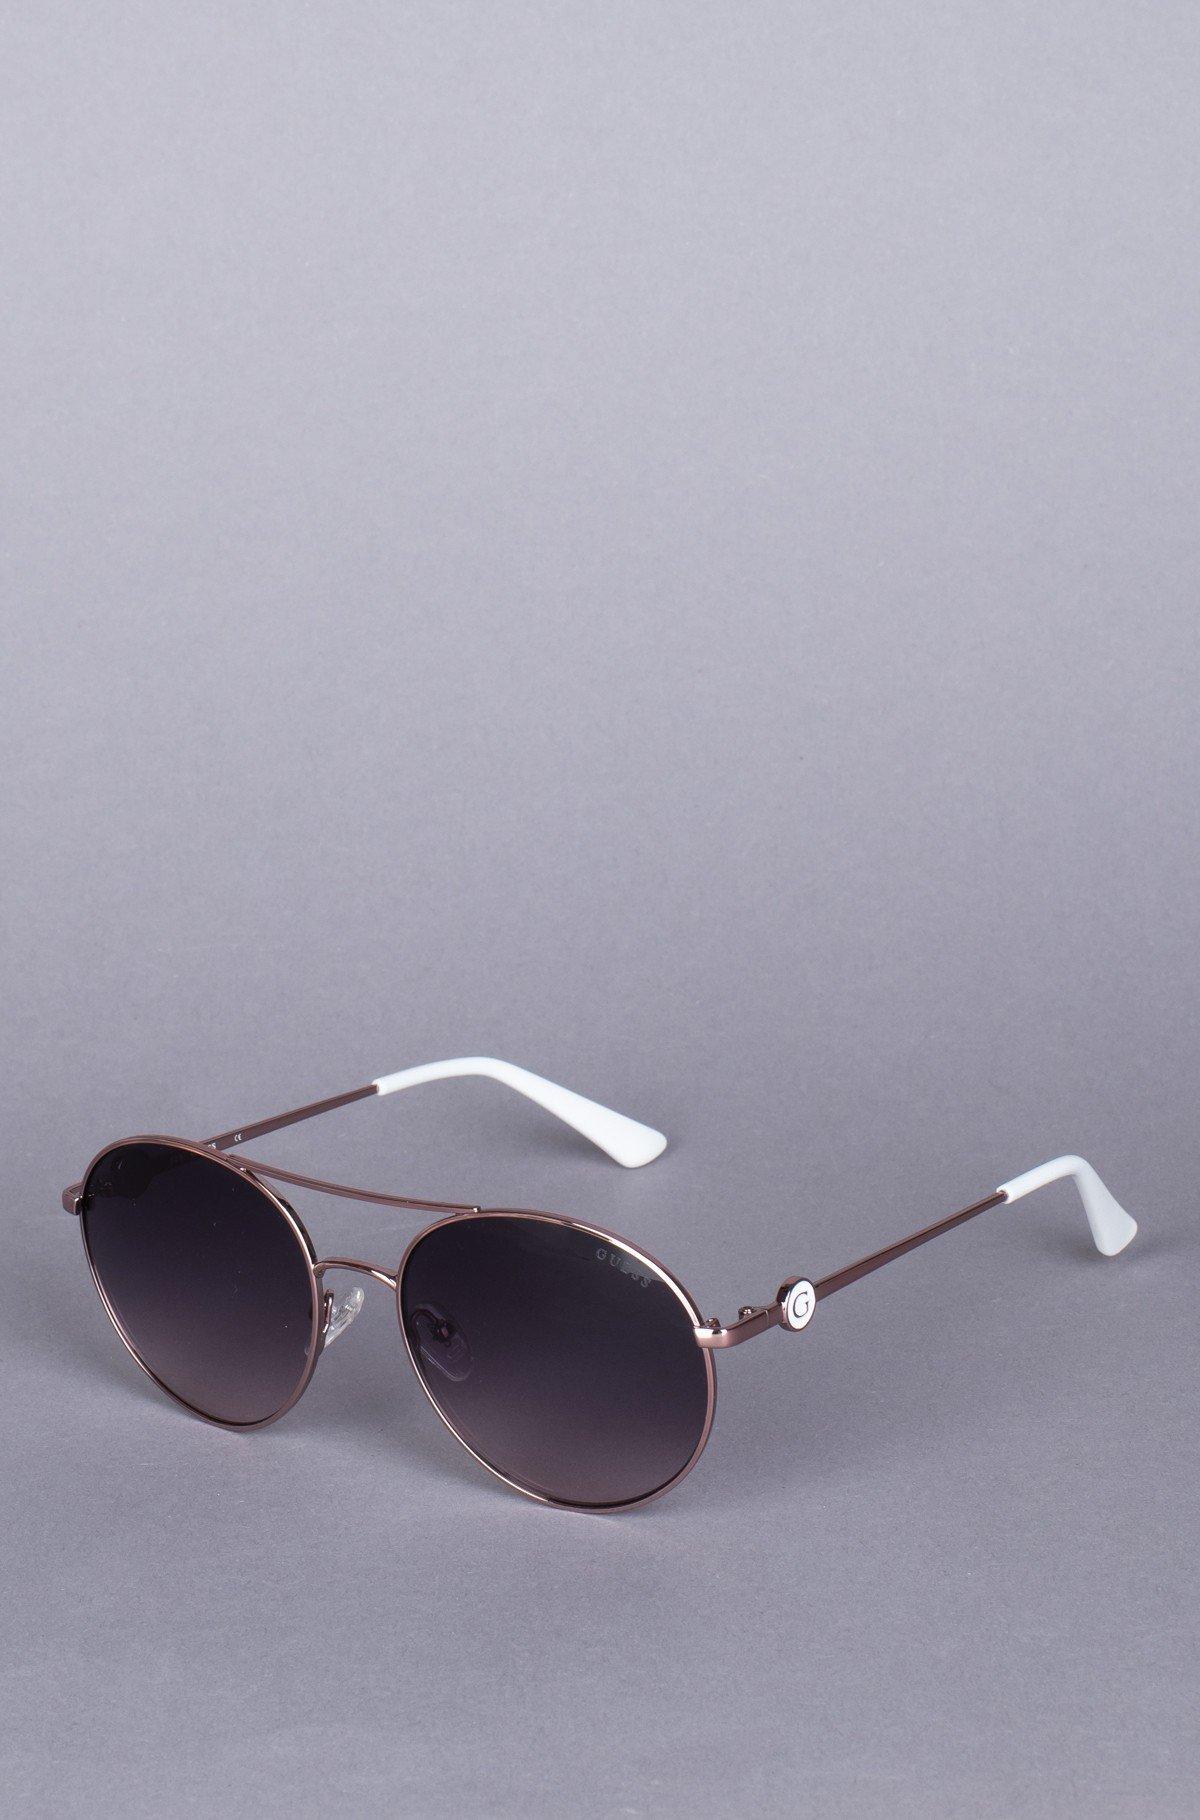 Sunglasses 7640-full-1